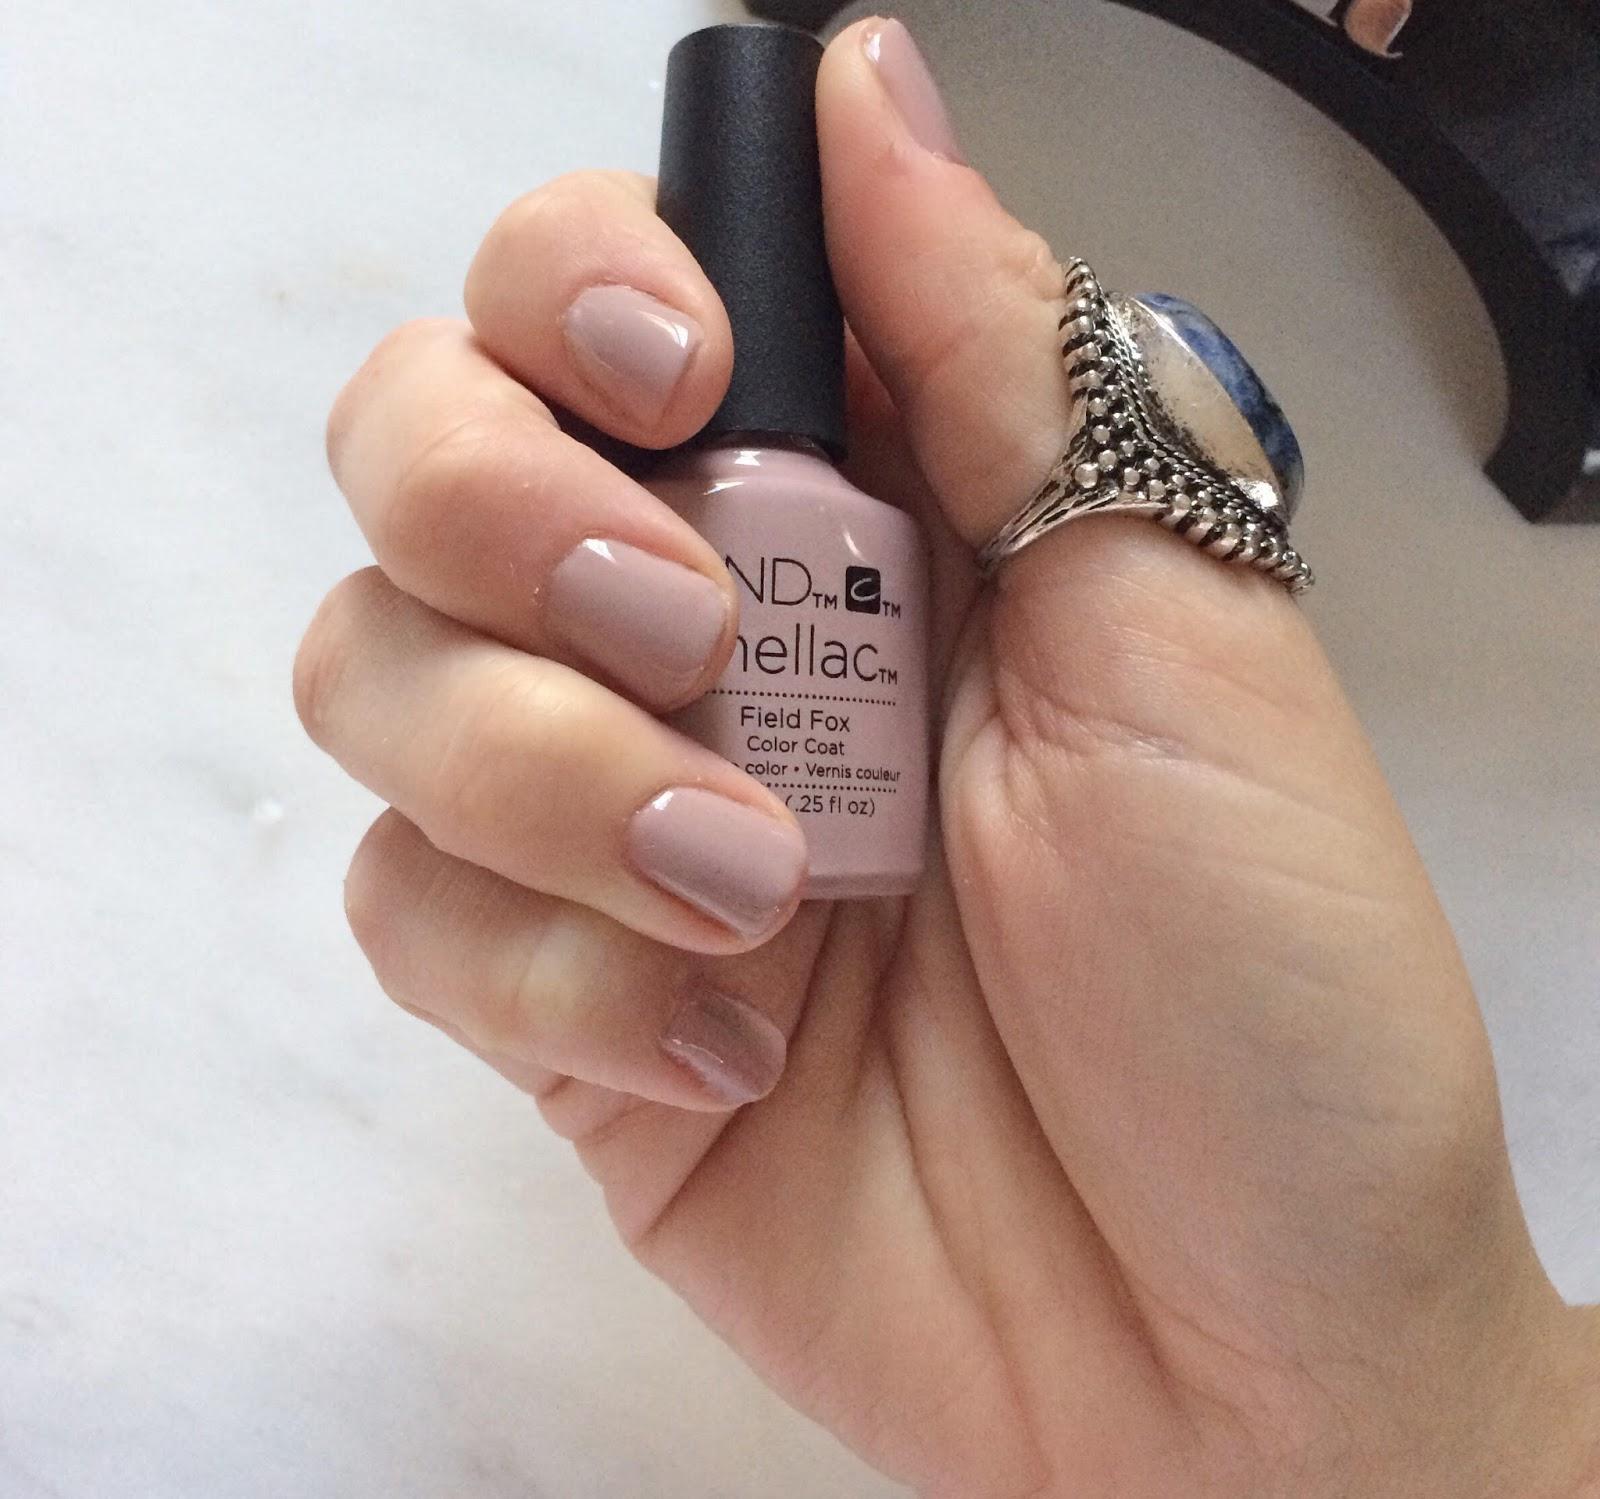 how to make nail polish last longer